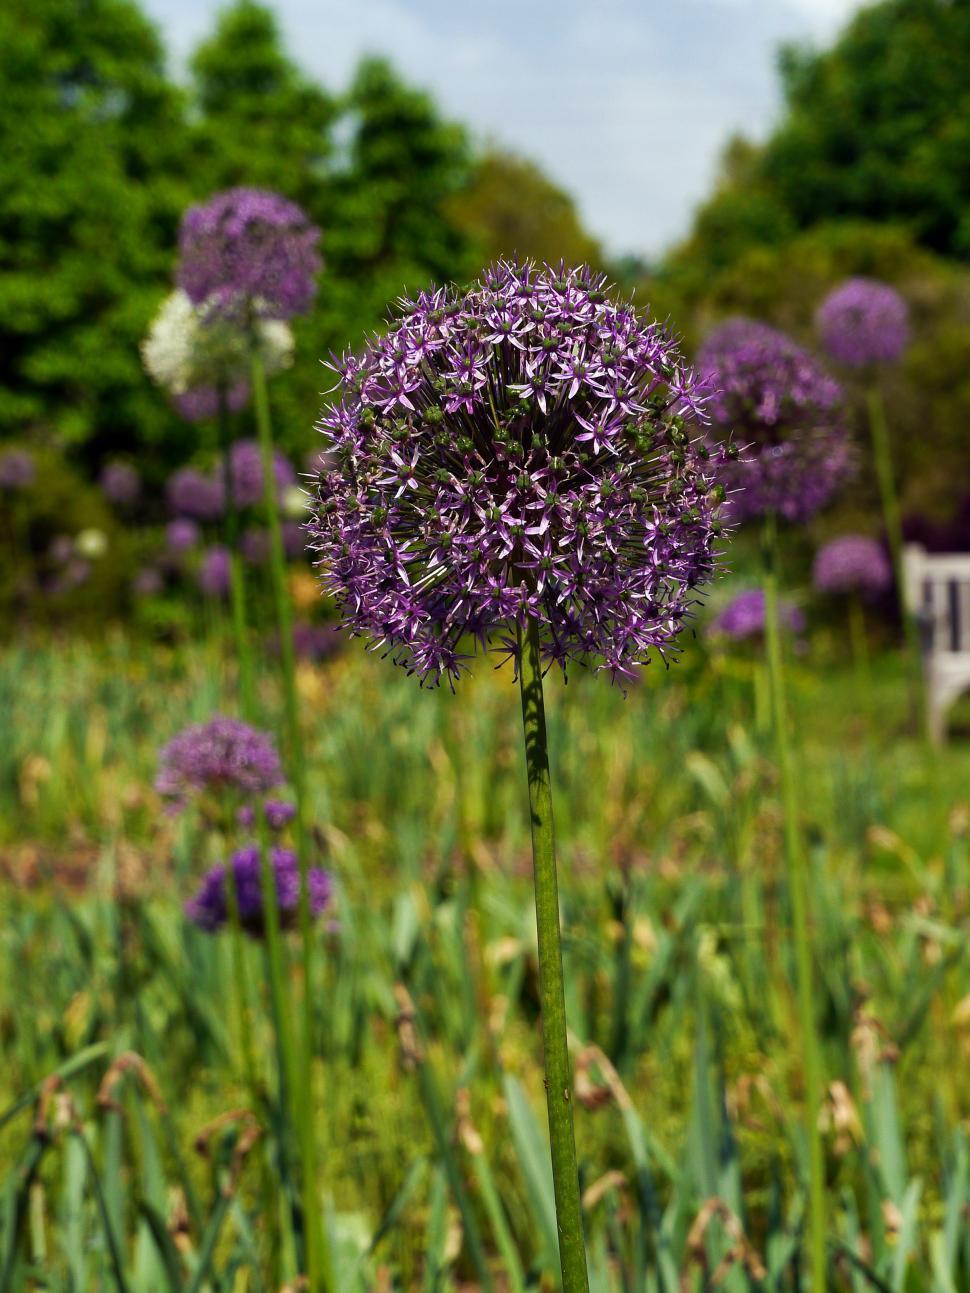 Download Free Stock Photo of Purple Allium Flowers